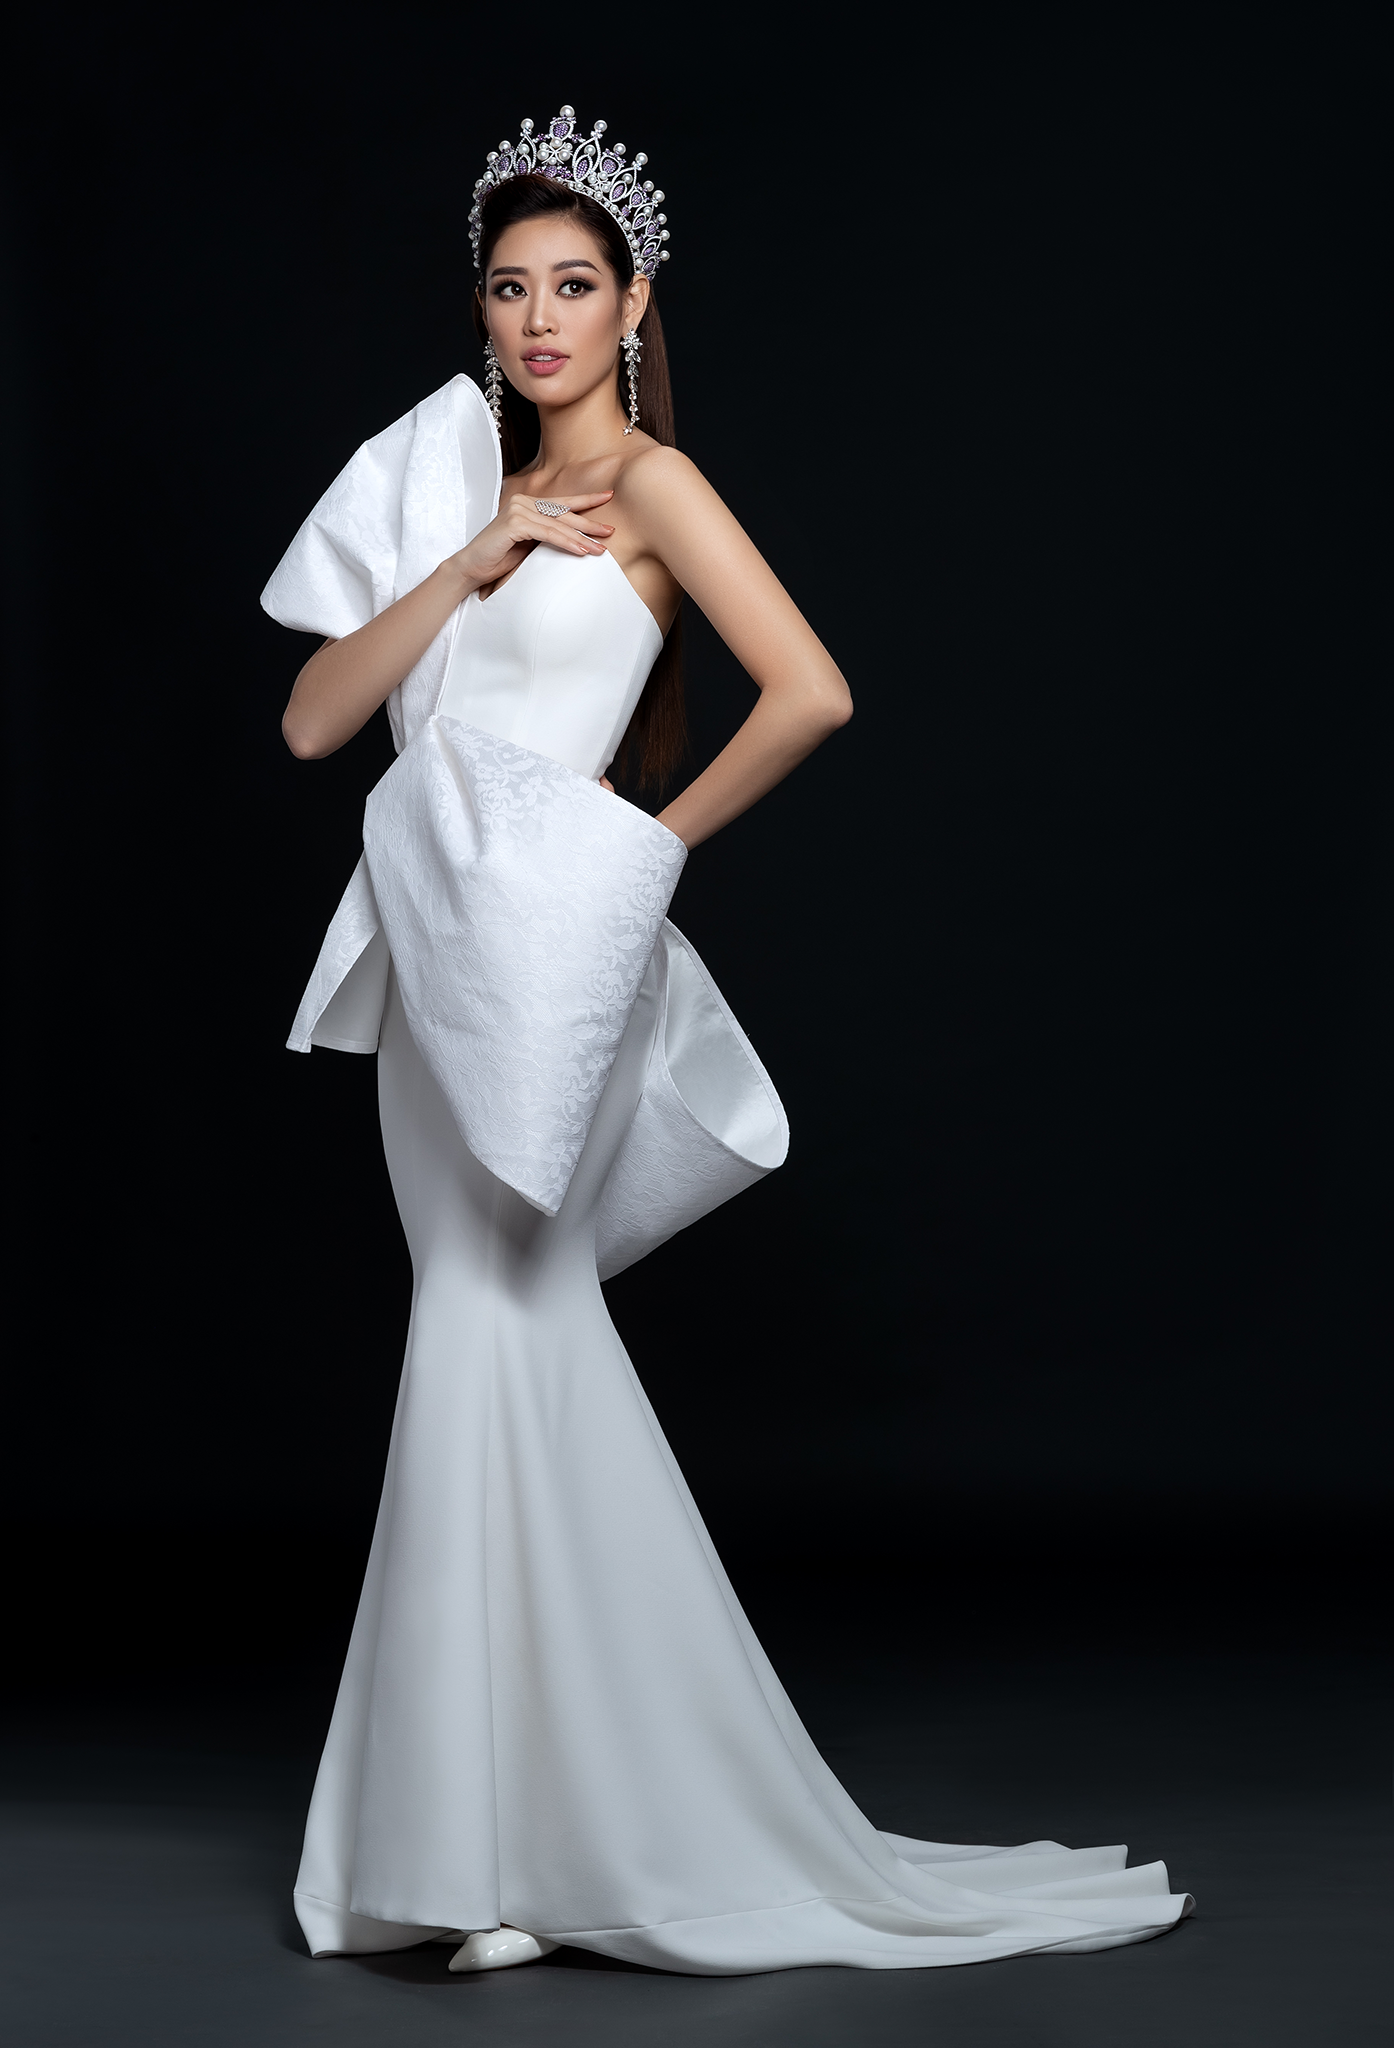 Hoa hau Khanh Van_Dress by Minh Tu (3)